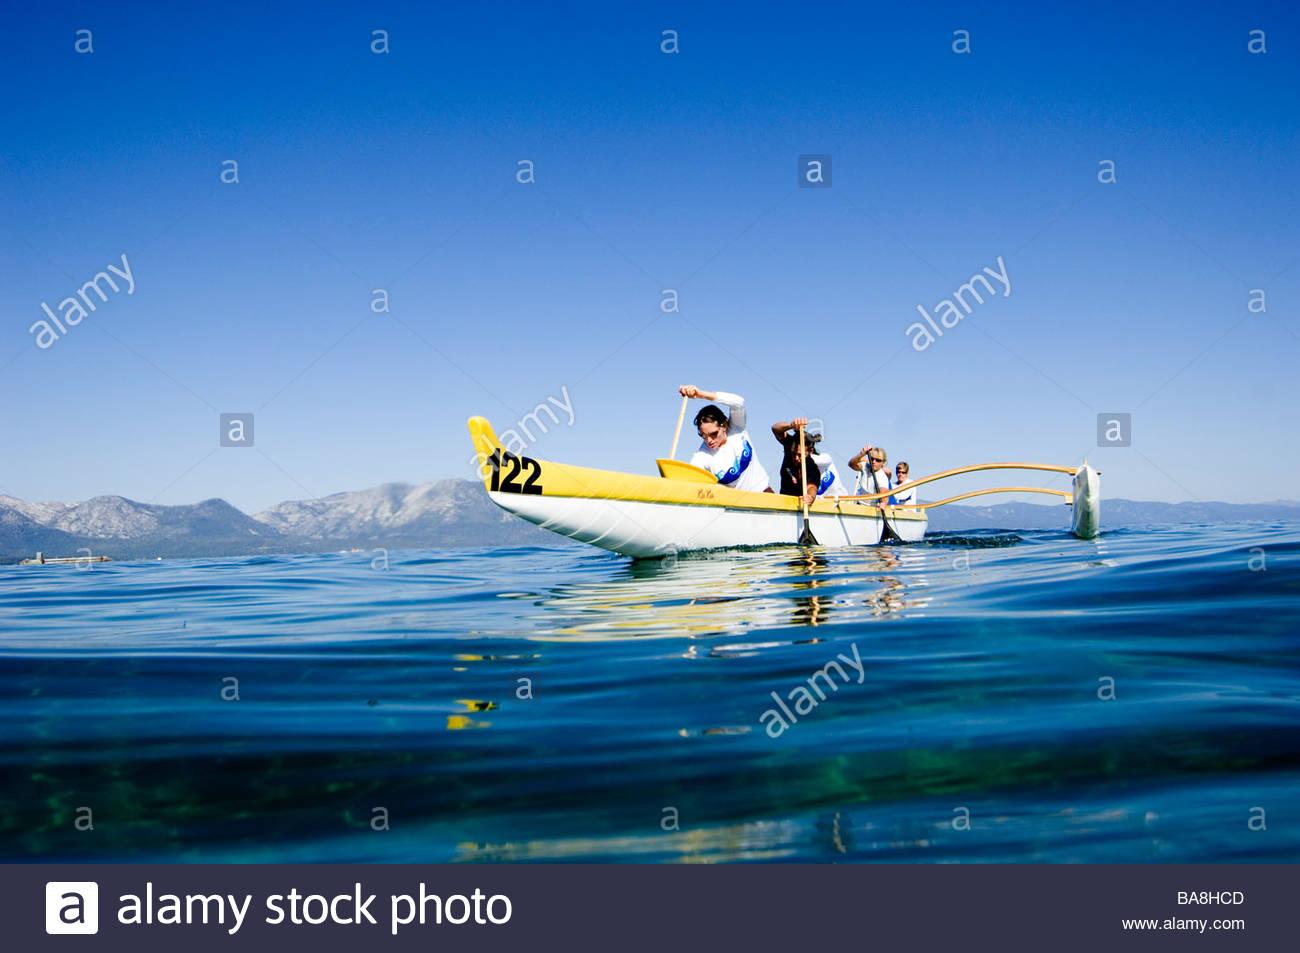 Five Women Paddling a Canoe on Lake Tahoe, California - Stock Image